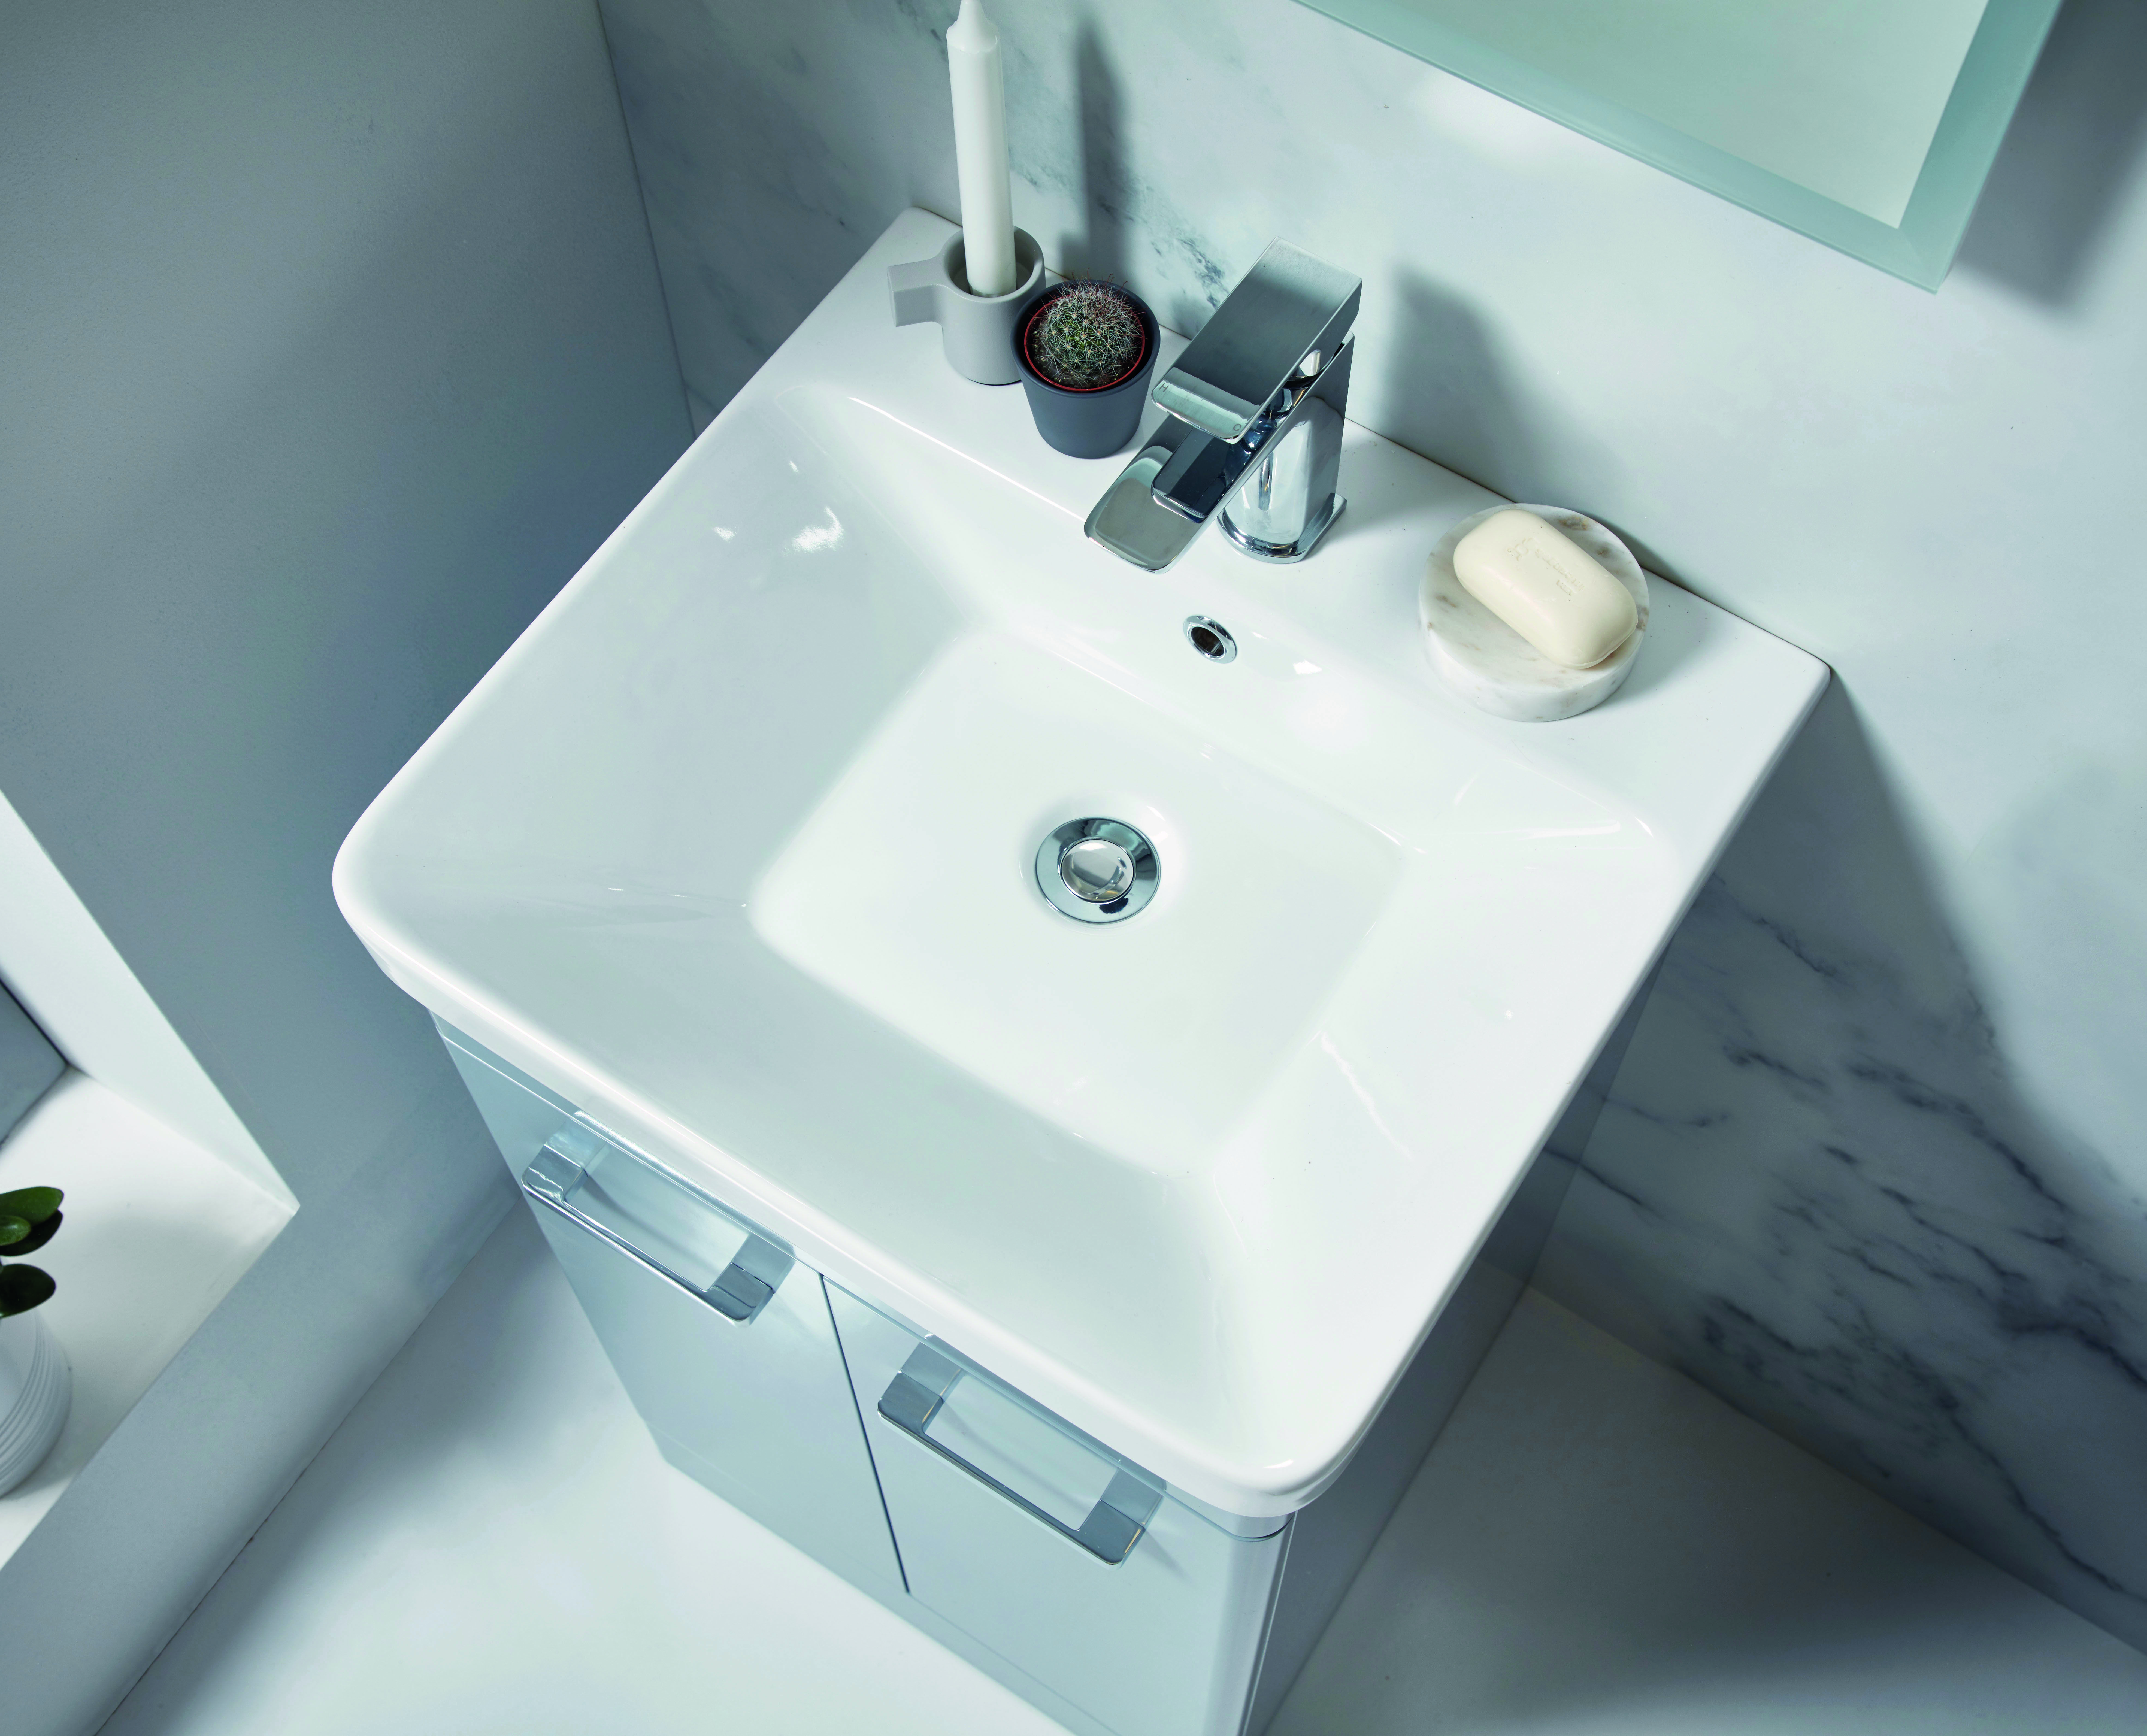 Bespoke bathroom storage in any style you fancy